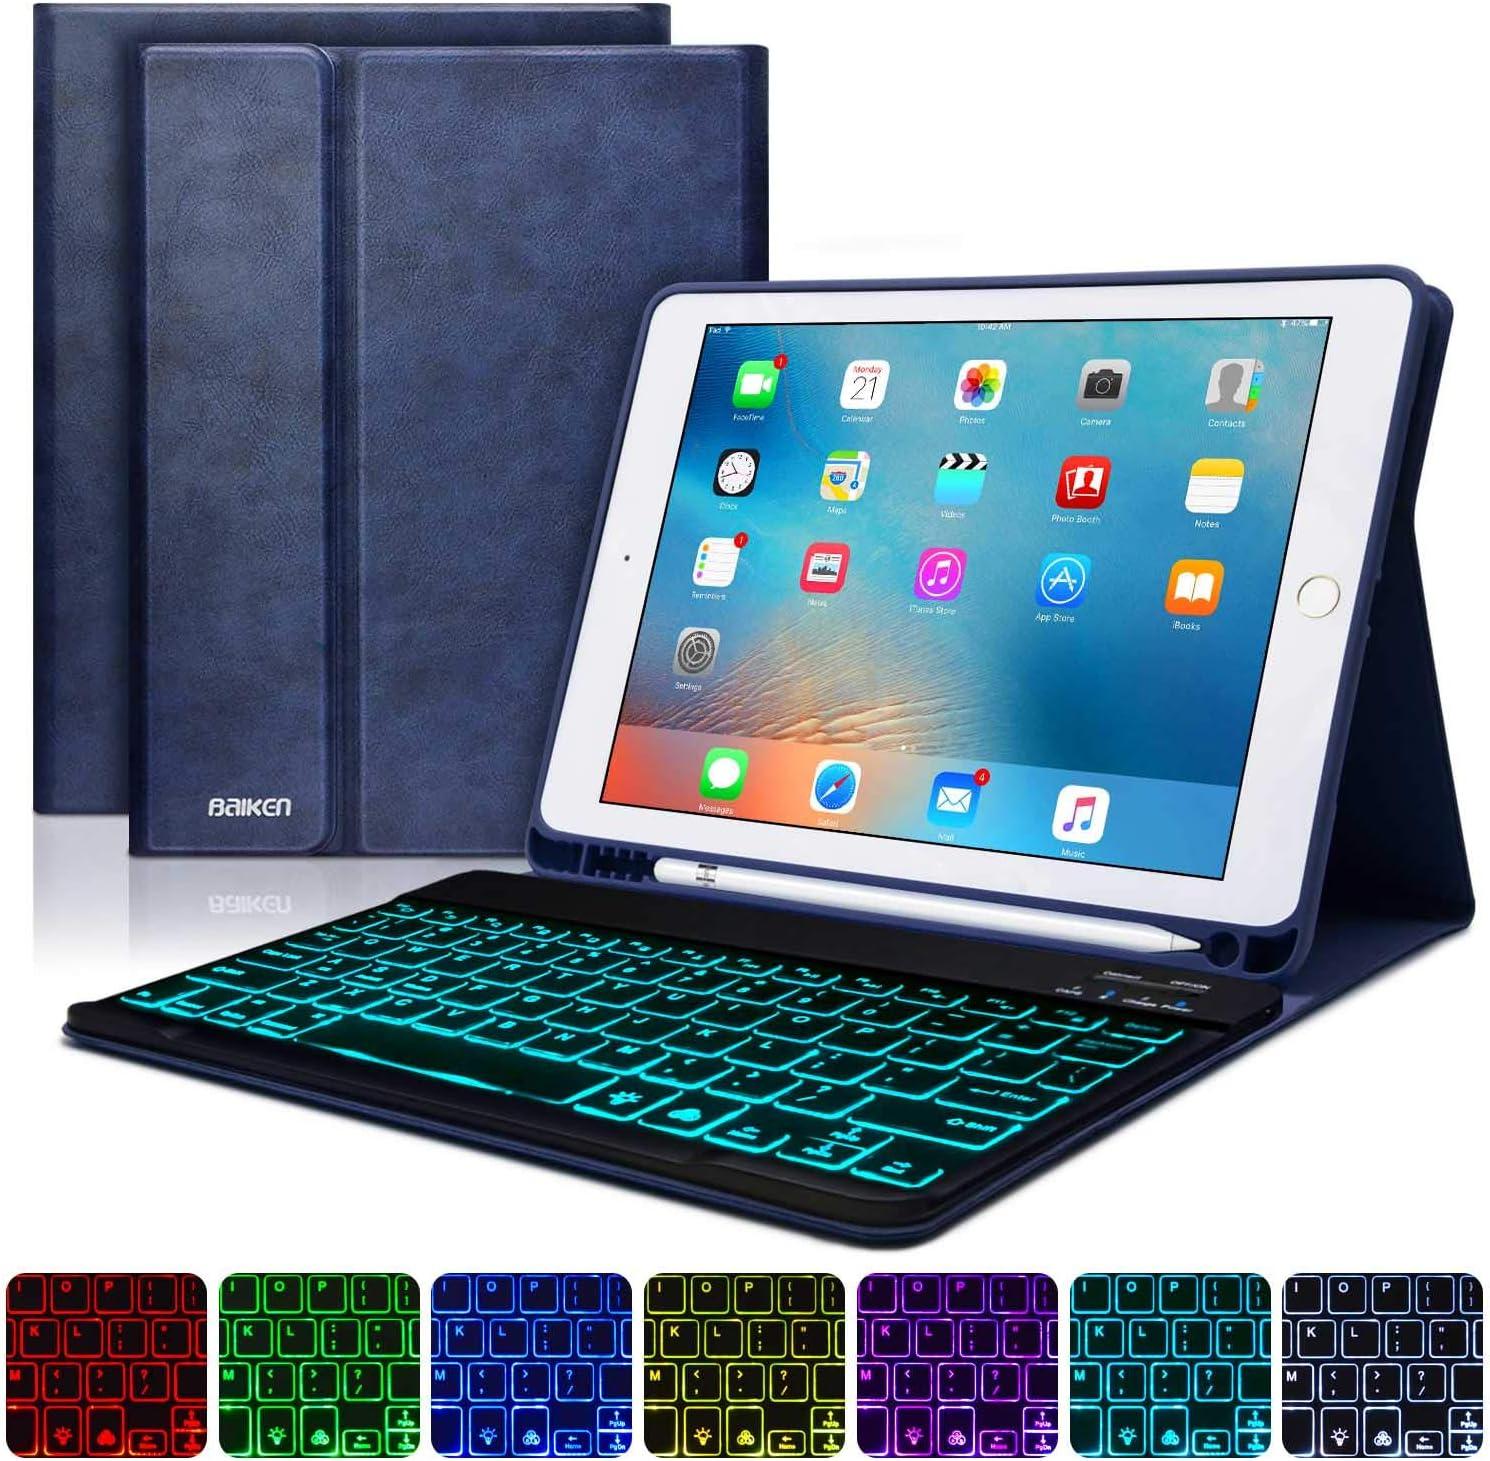 iPad 9.7 Keyboard Case for iPad 6th Gen 2018 -iPad 5th Gen 2017 -iPad Pro 9.7 -iPad Air 2&1 -iPad Case with Backlit Keyboard and Pencil Holder-Bluetooth Removable Keyboard